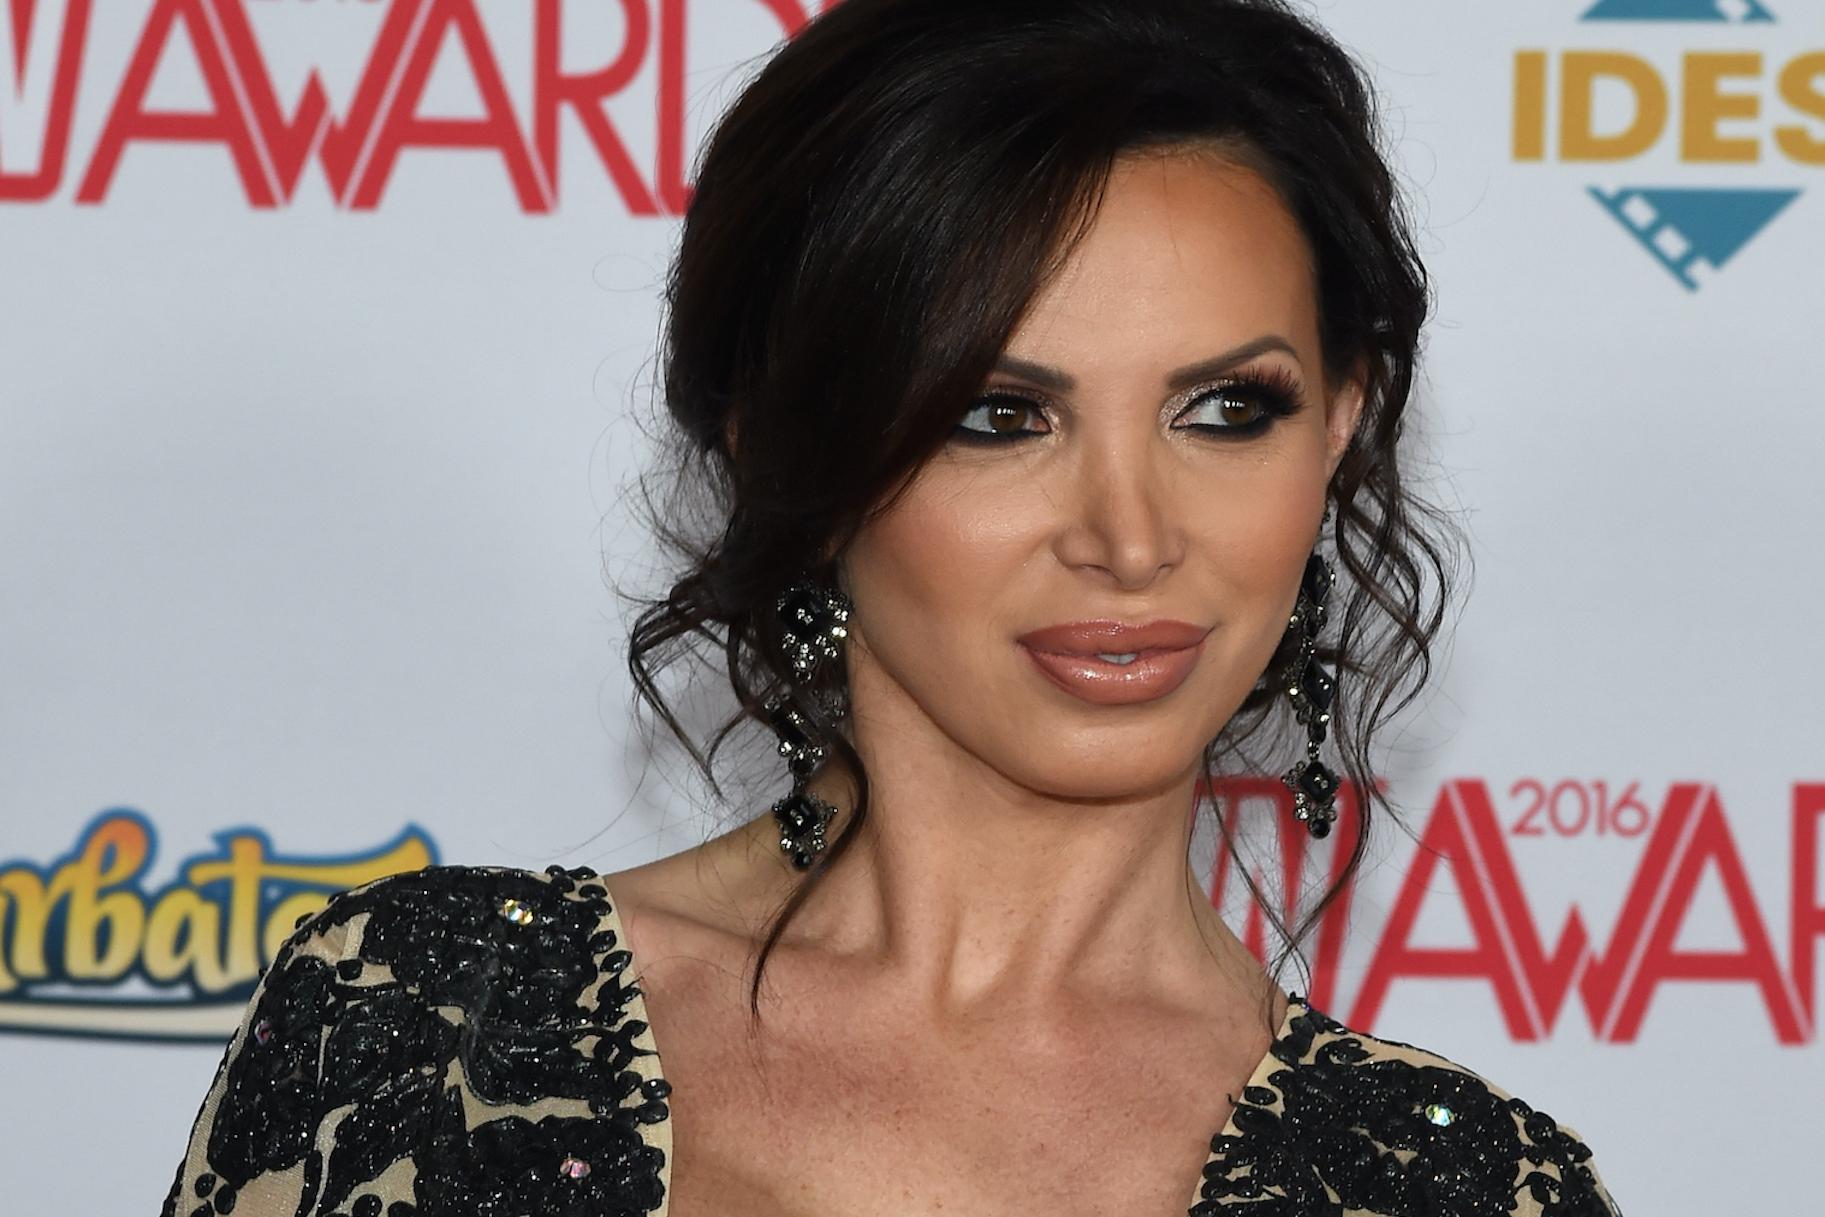 Porn Star Nikki Benz Sues Brazzers And Co-Stars, Alleging